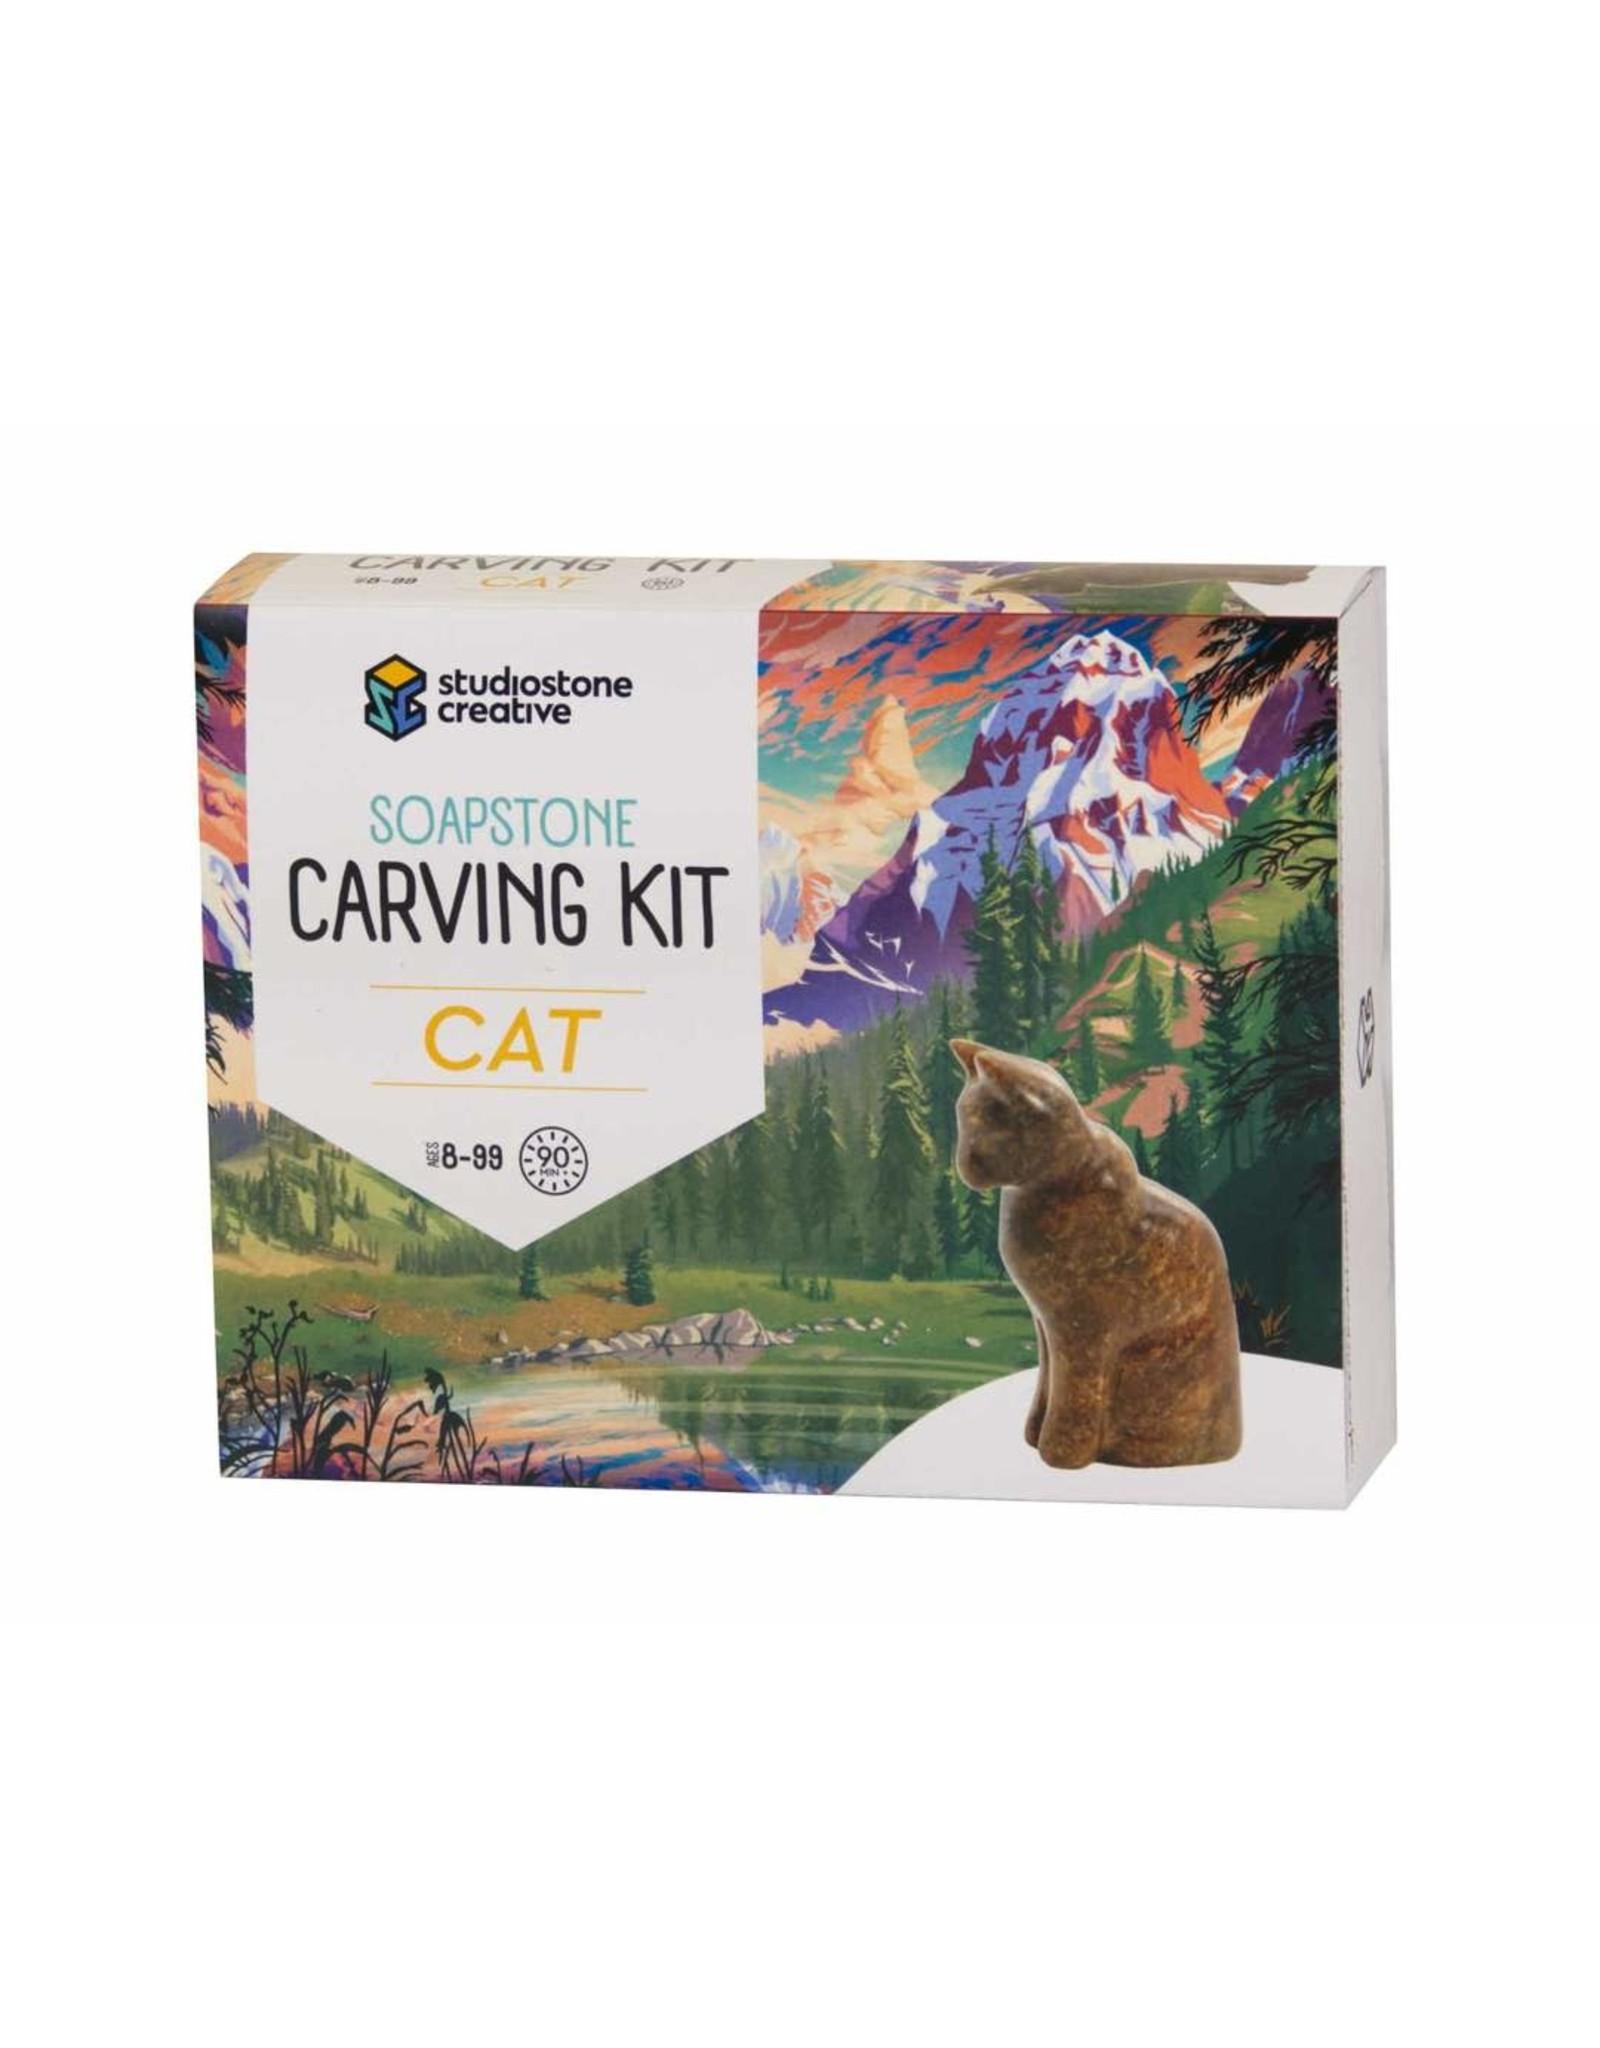 Studiostone Creative Cat Soapstone Carving Kit